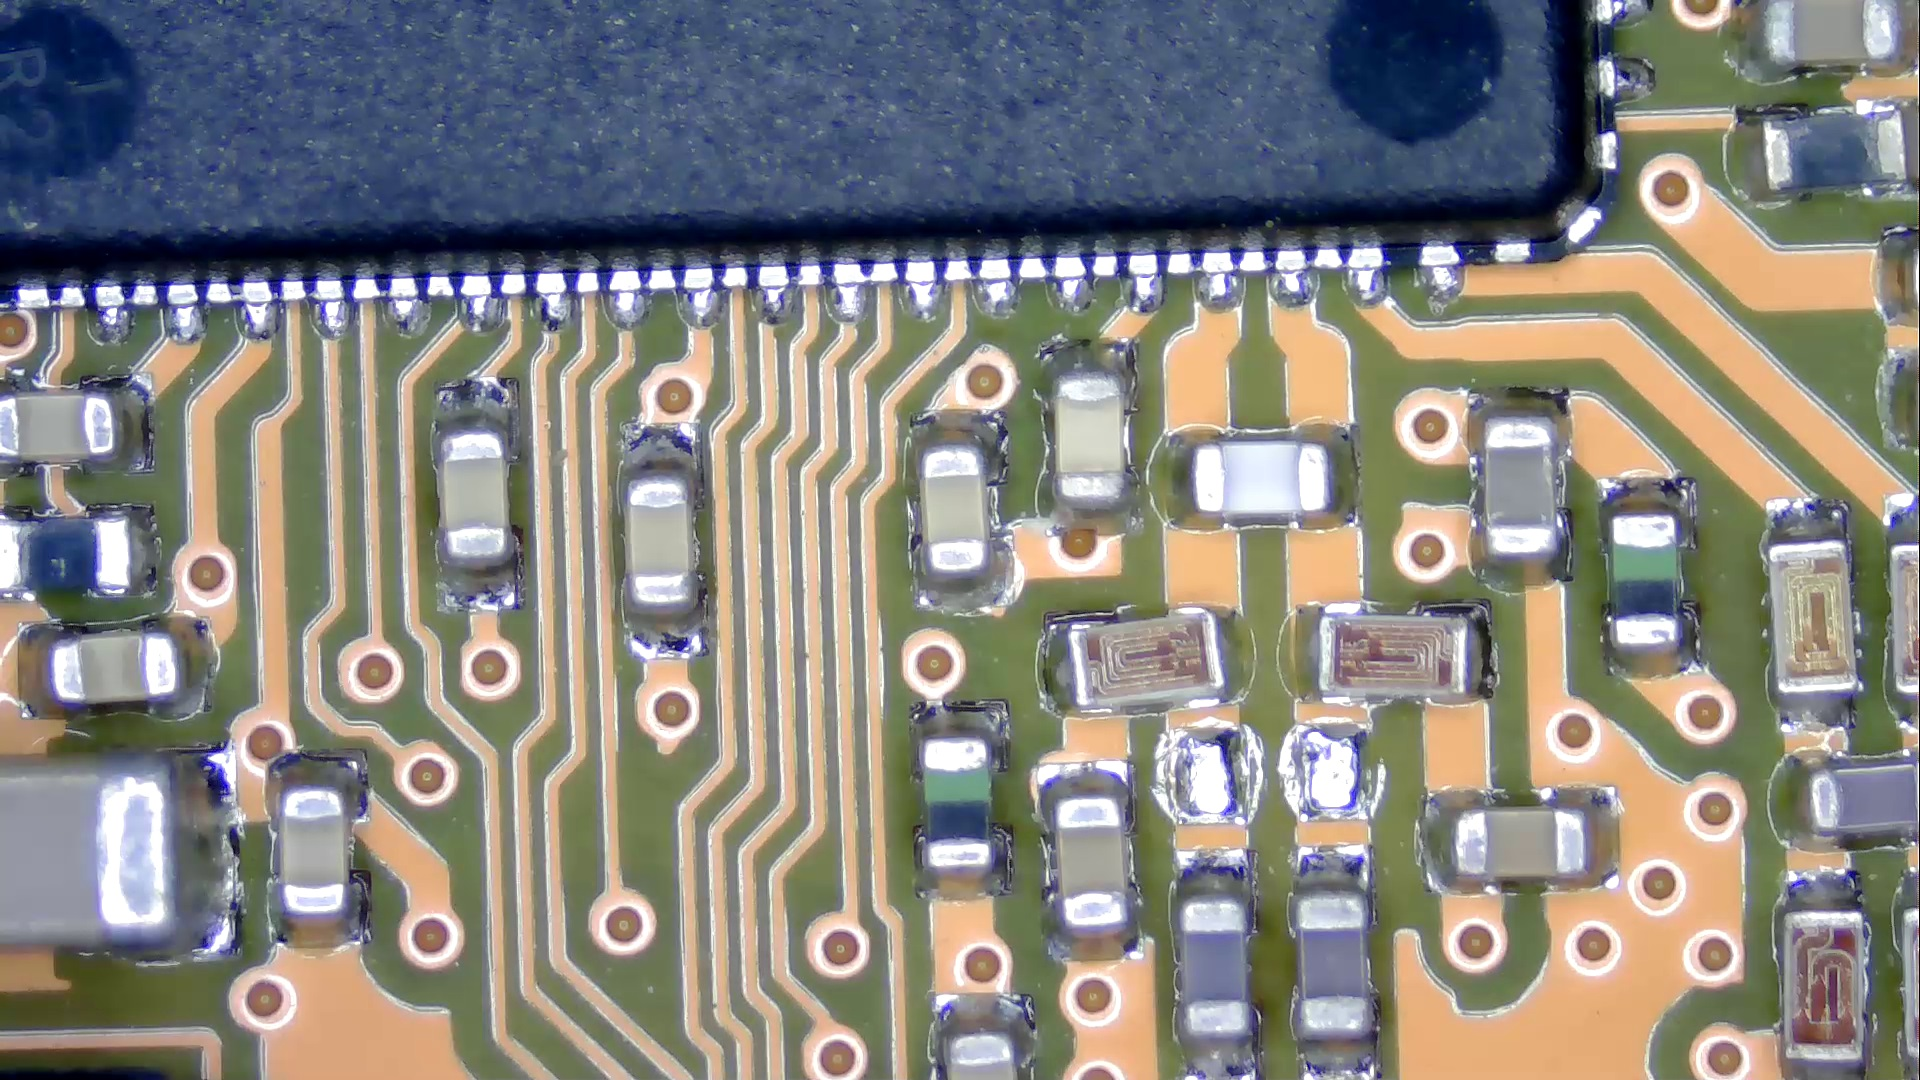 SMD_parts_10cm_x0.7